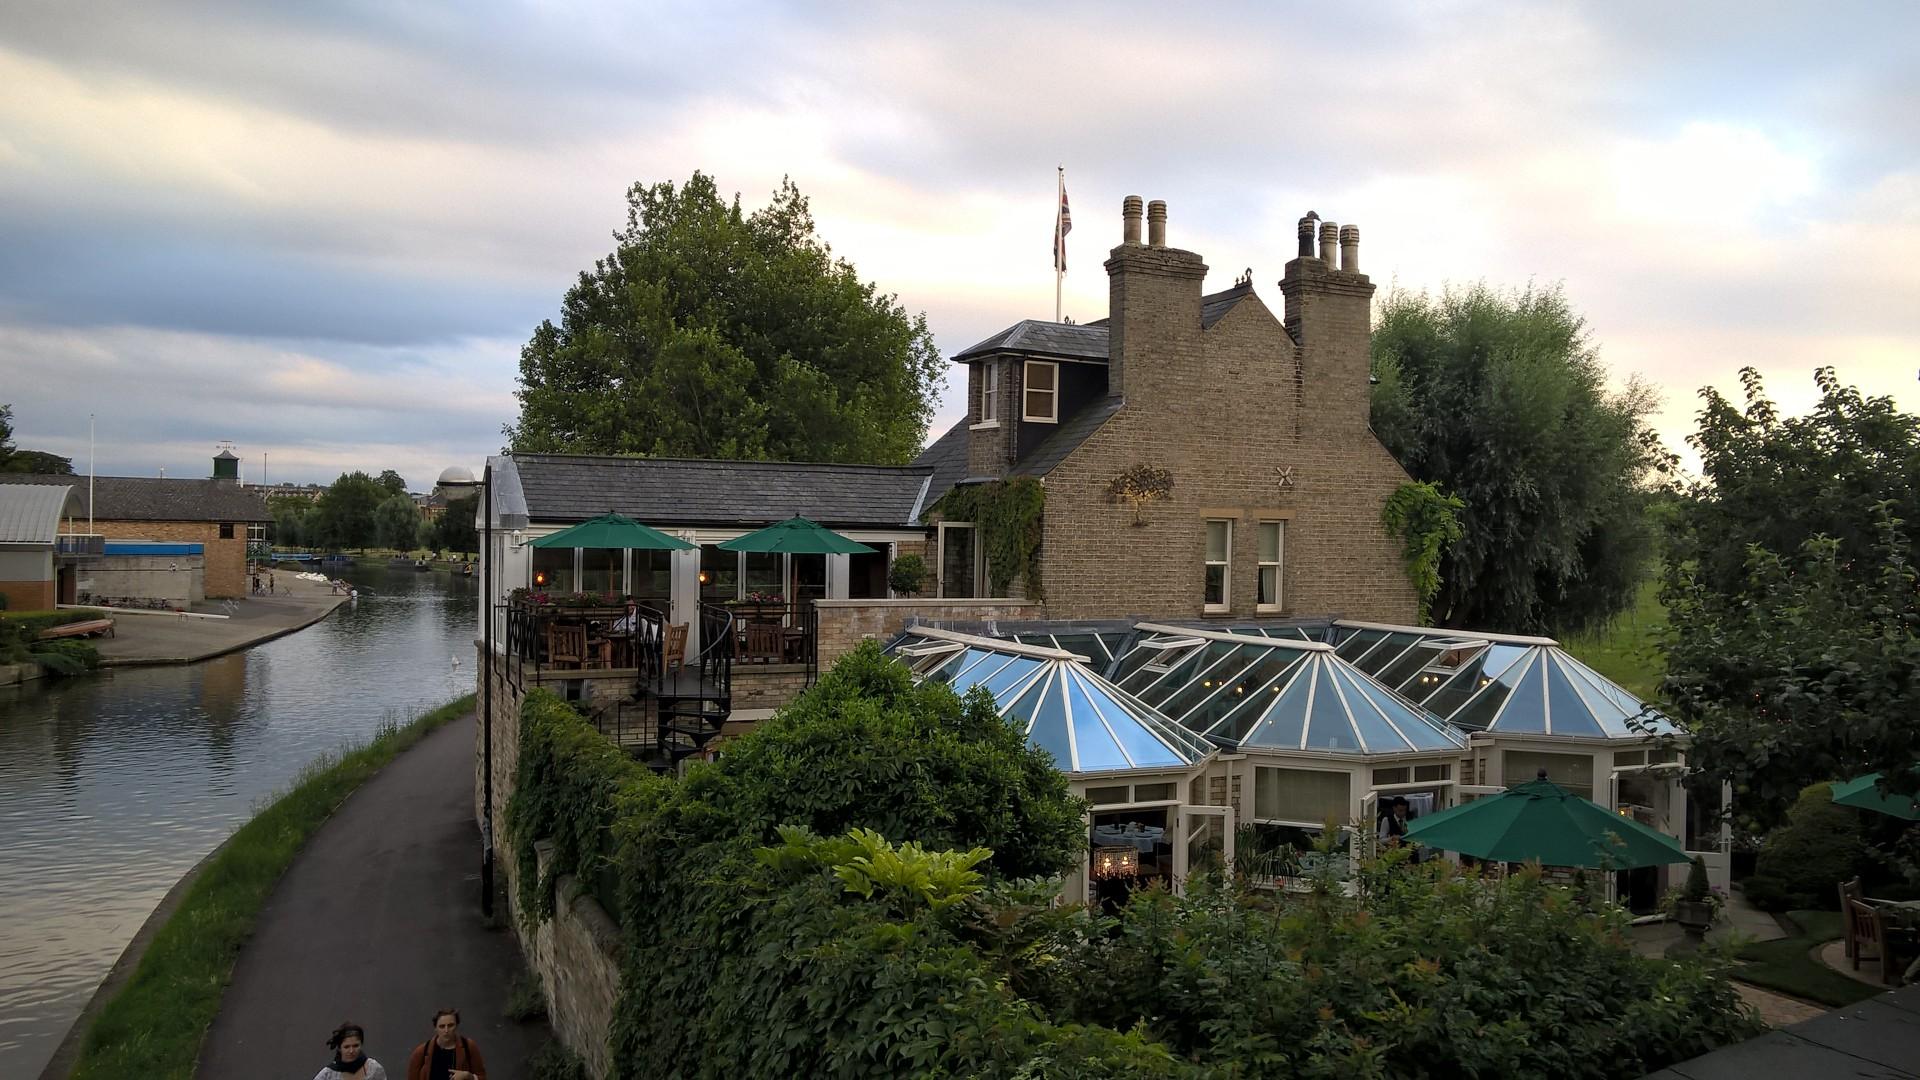 Midsummer House Restaurant Cambridge midsummer house – review | dinner at the manor